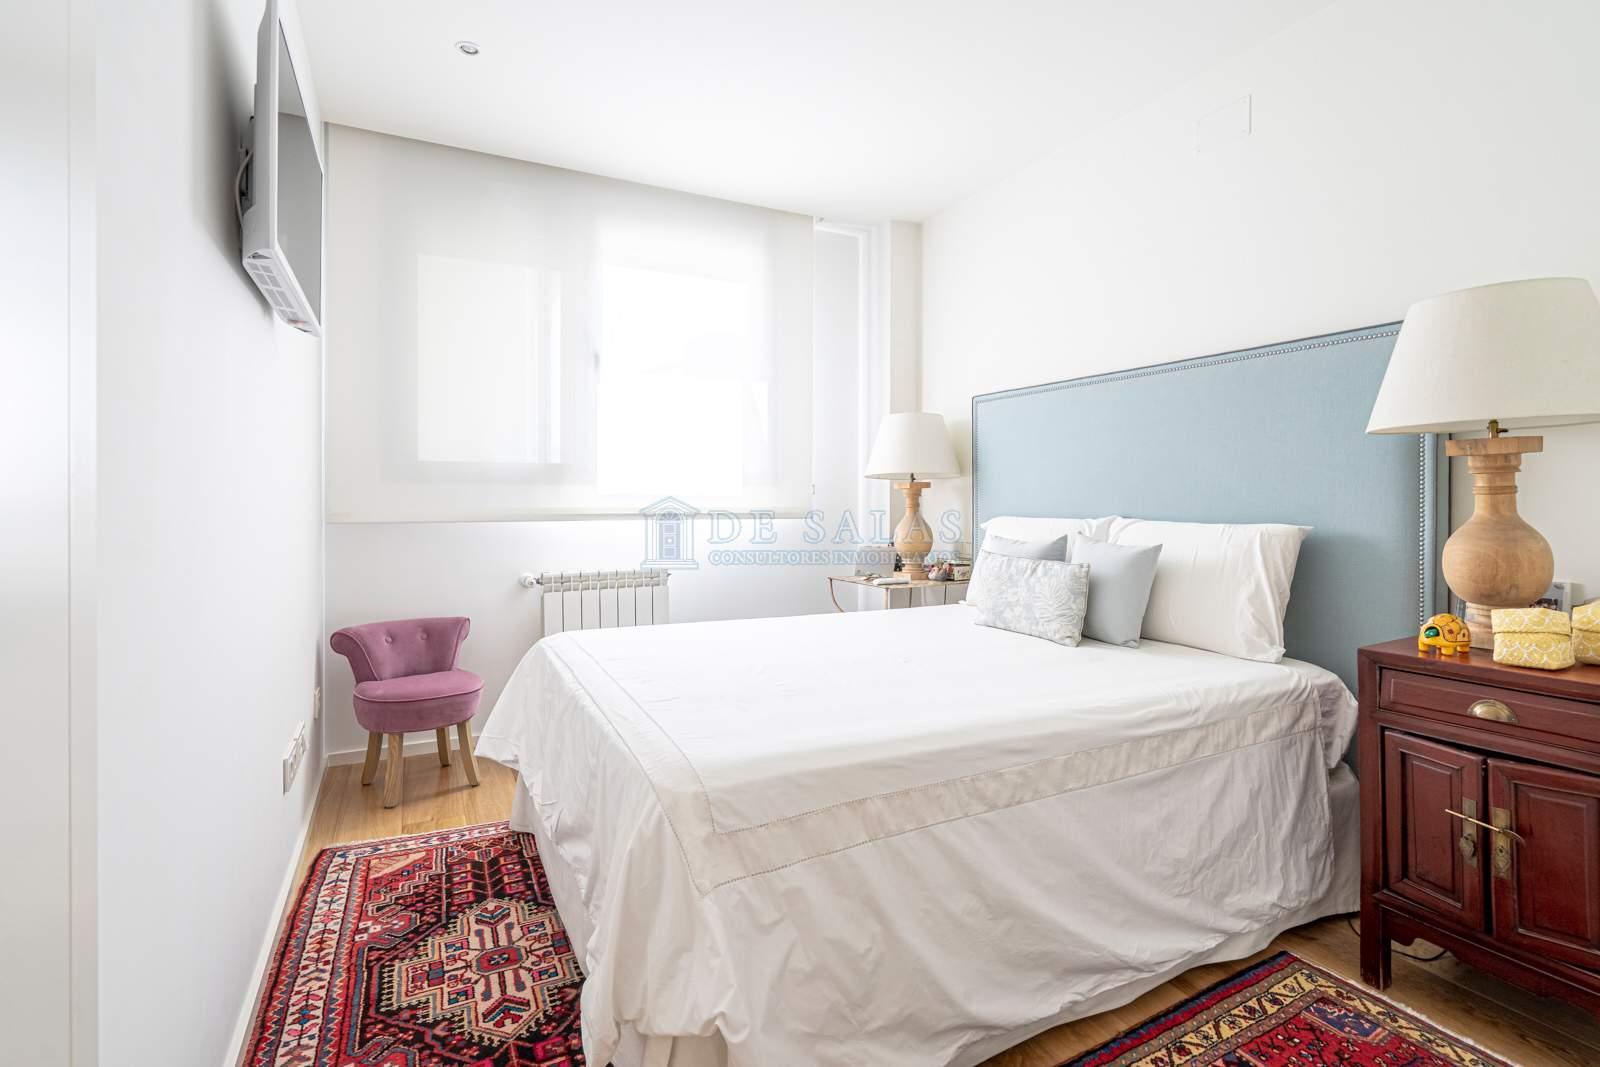 Dormitorio-0020